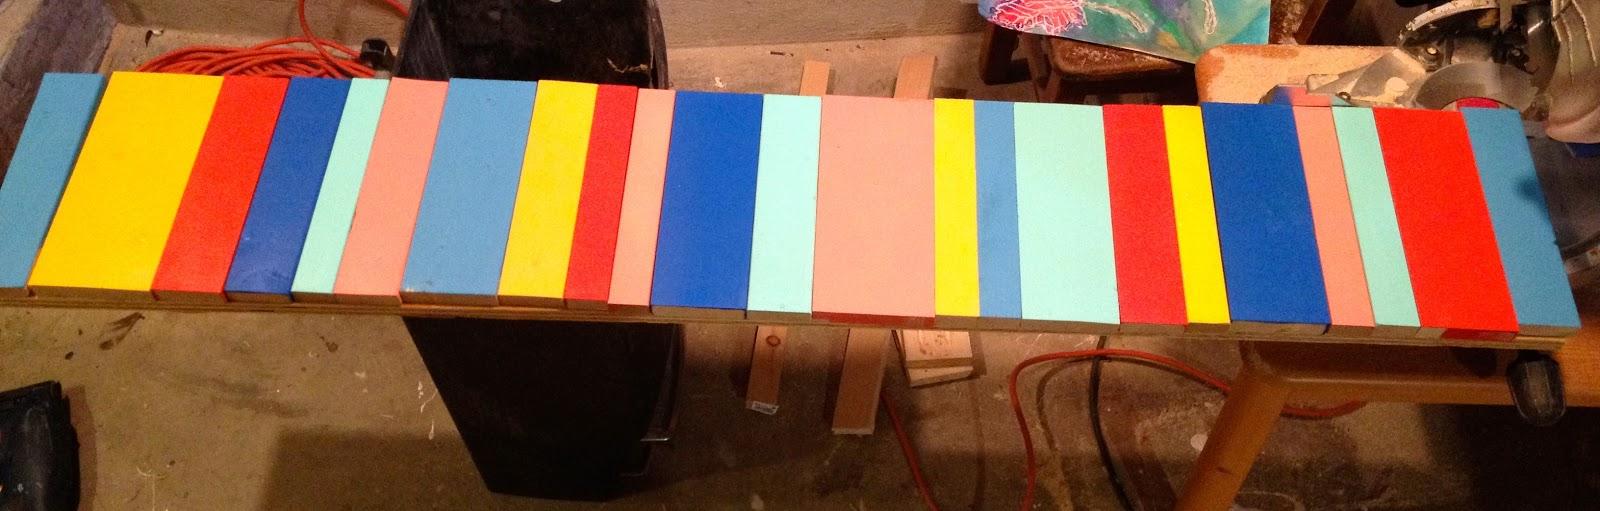 diy multi-color planks